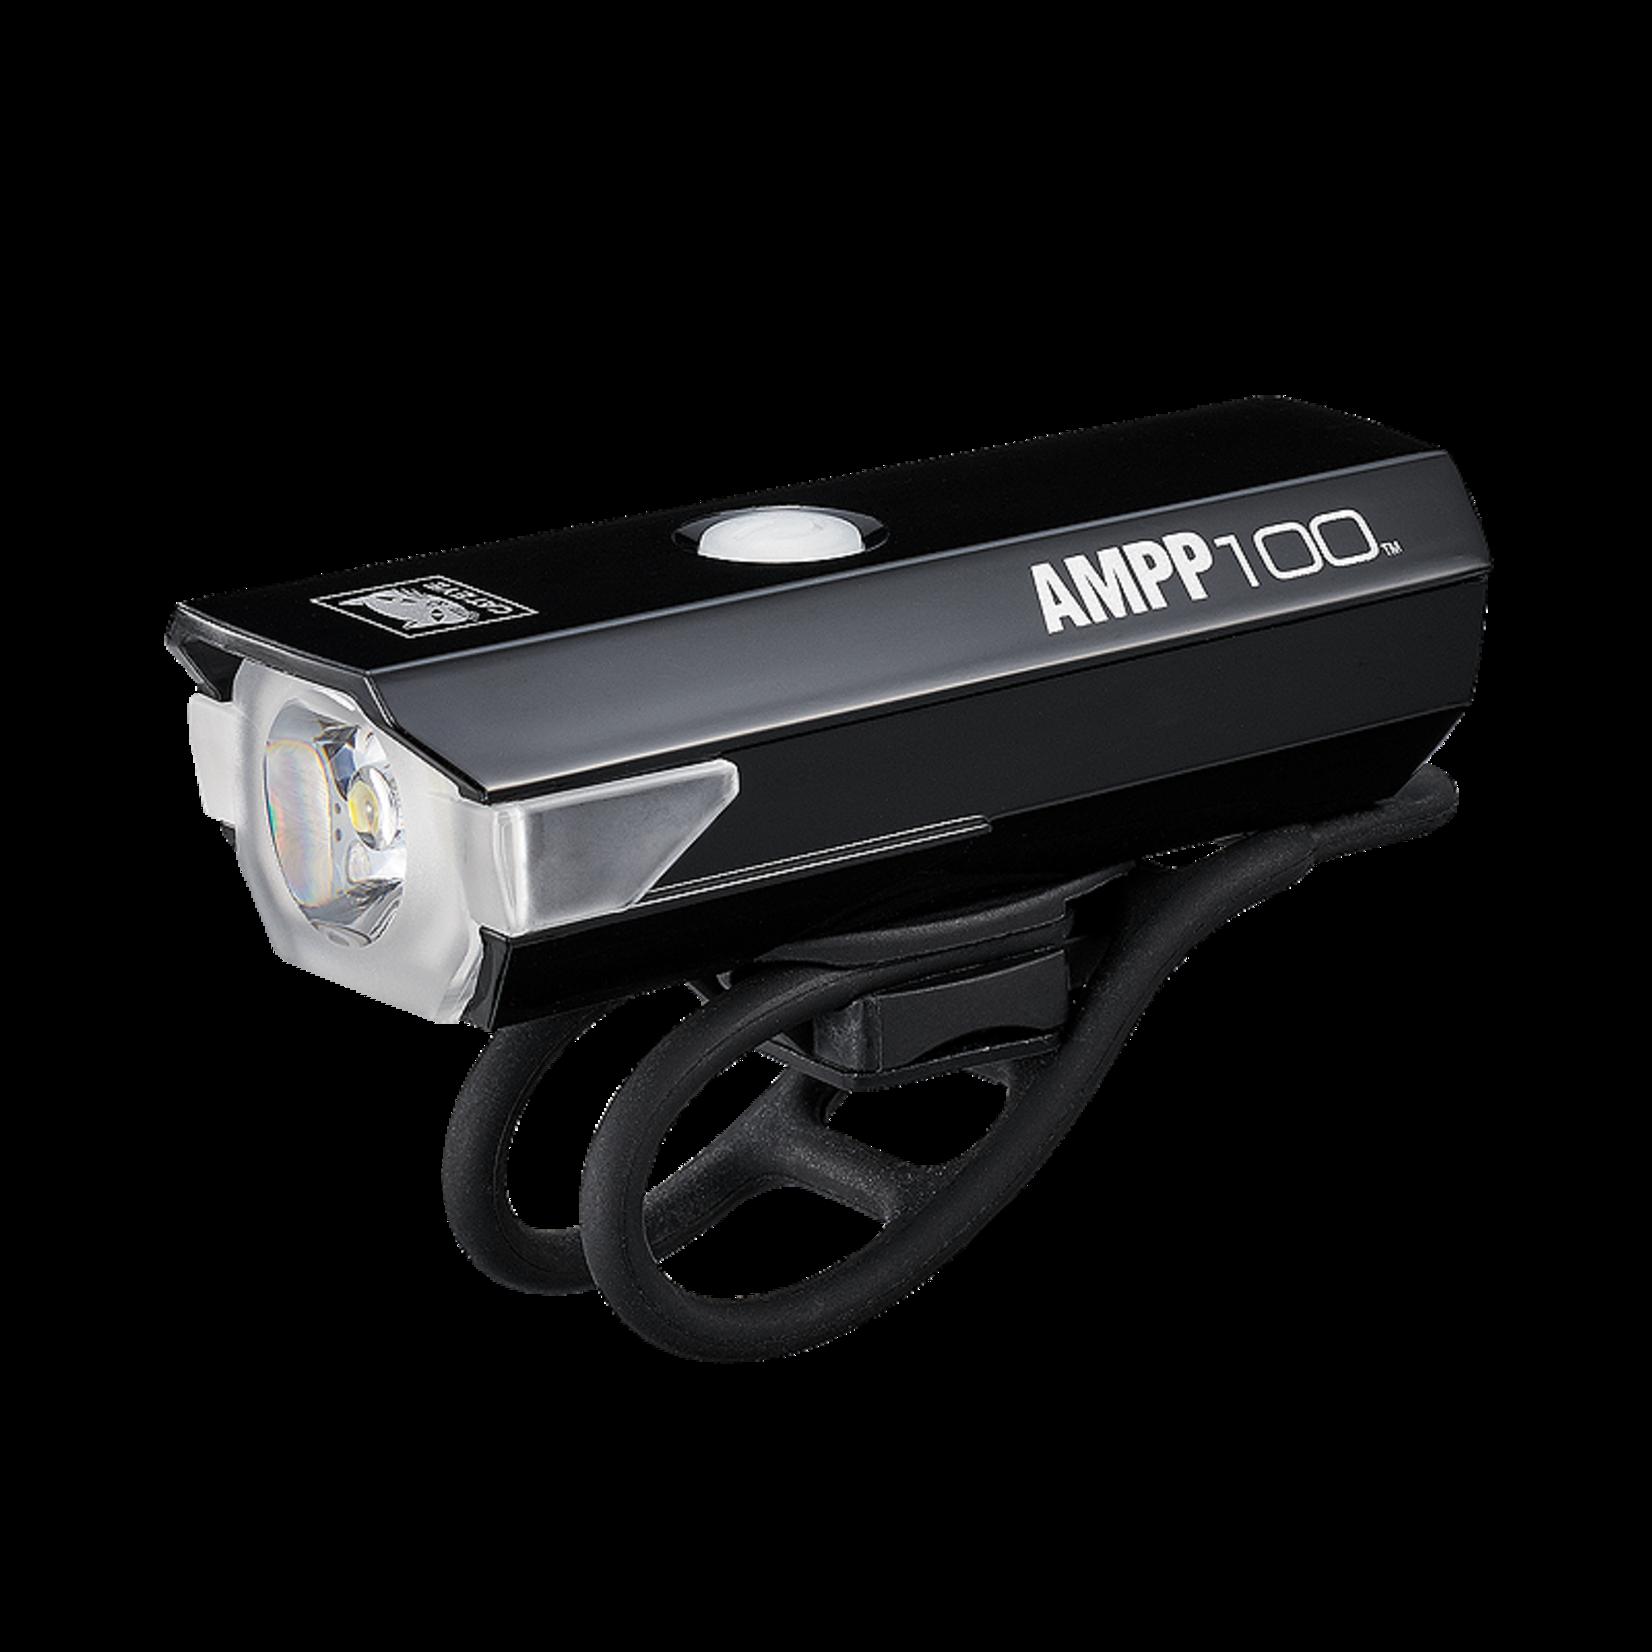 Cateye CATEYE AMPP 100 FRONT LIGHT